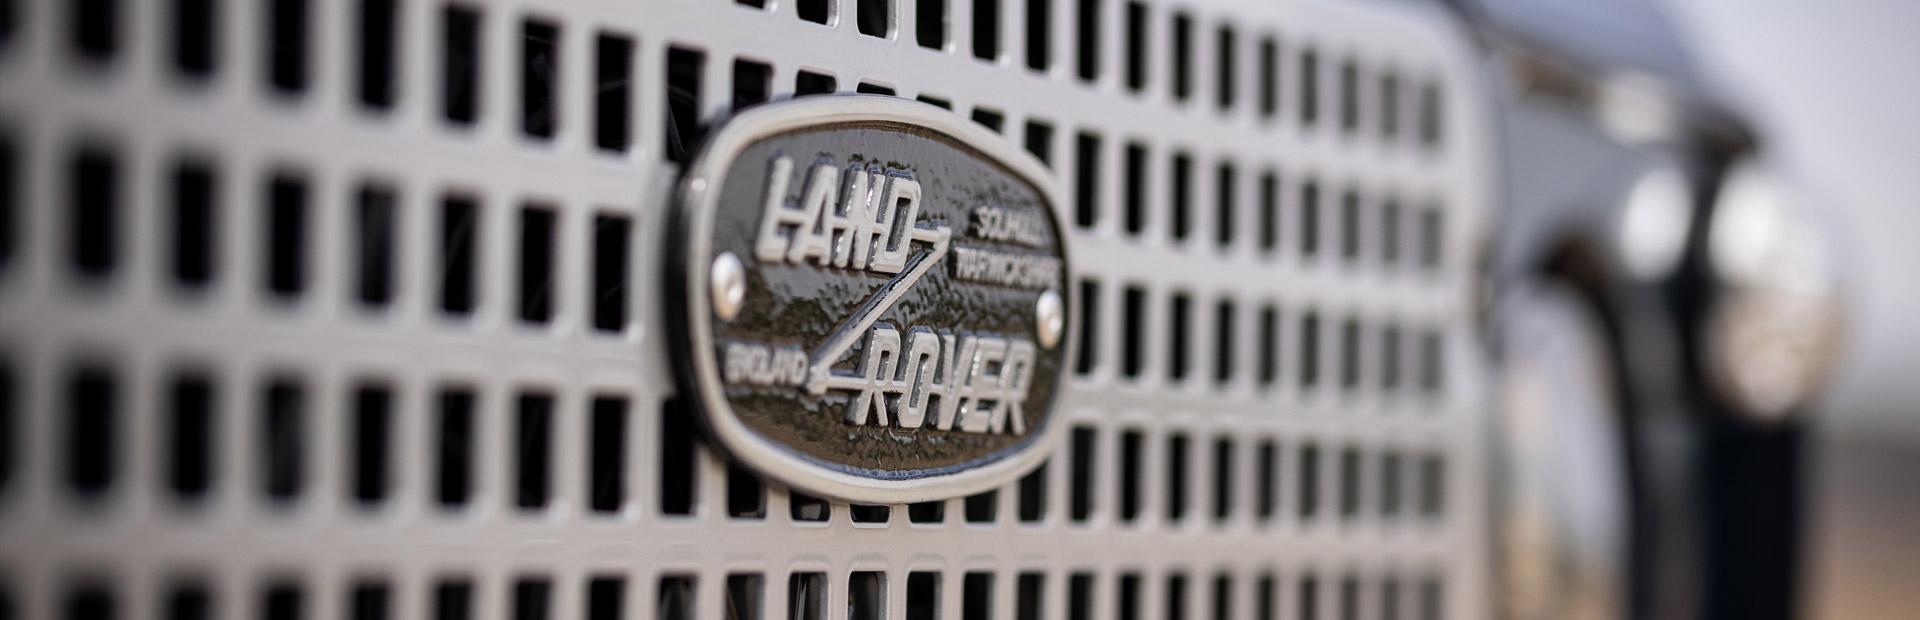 Arkonik Aloha - Custom built Land Rover Defender 90